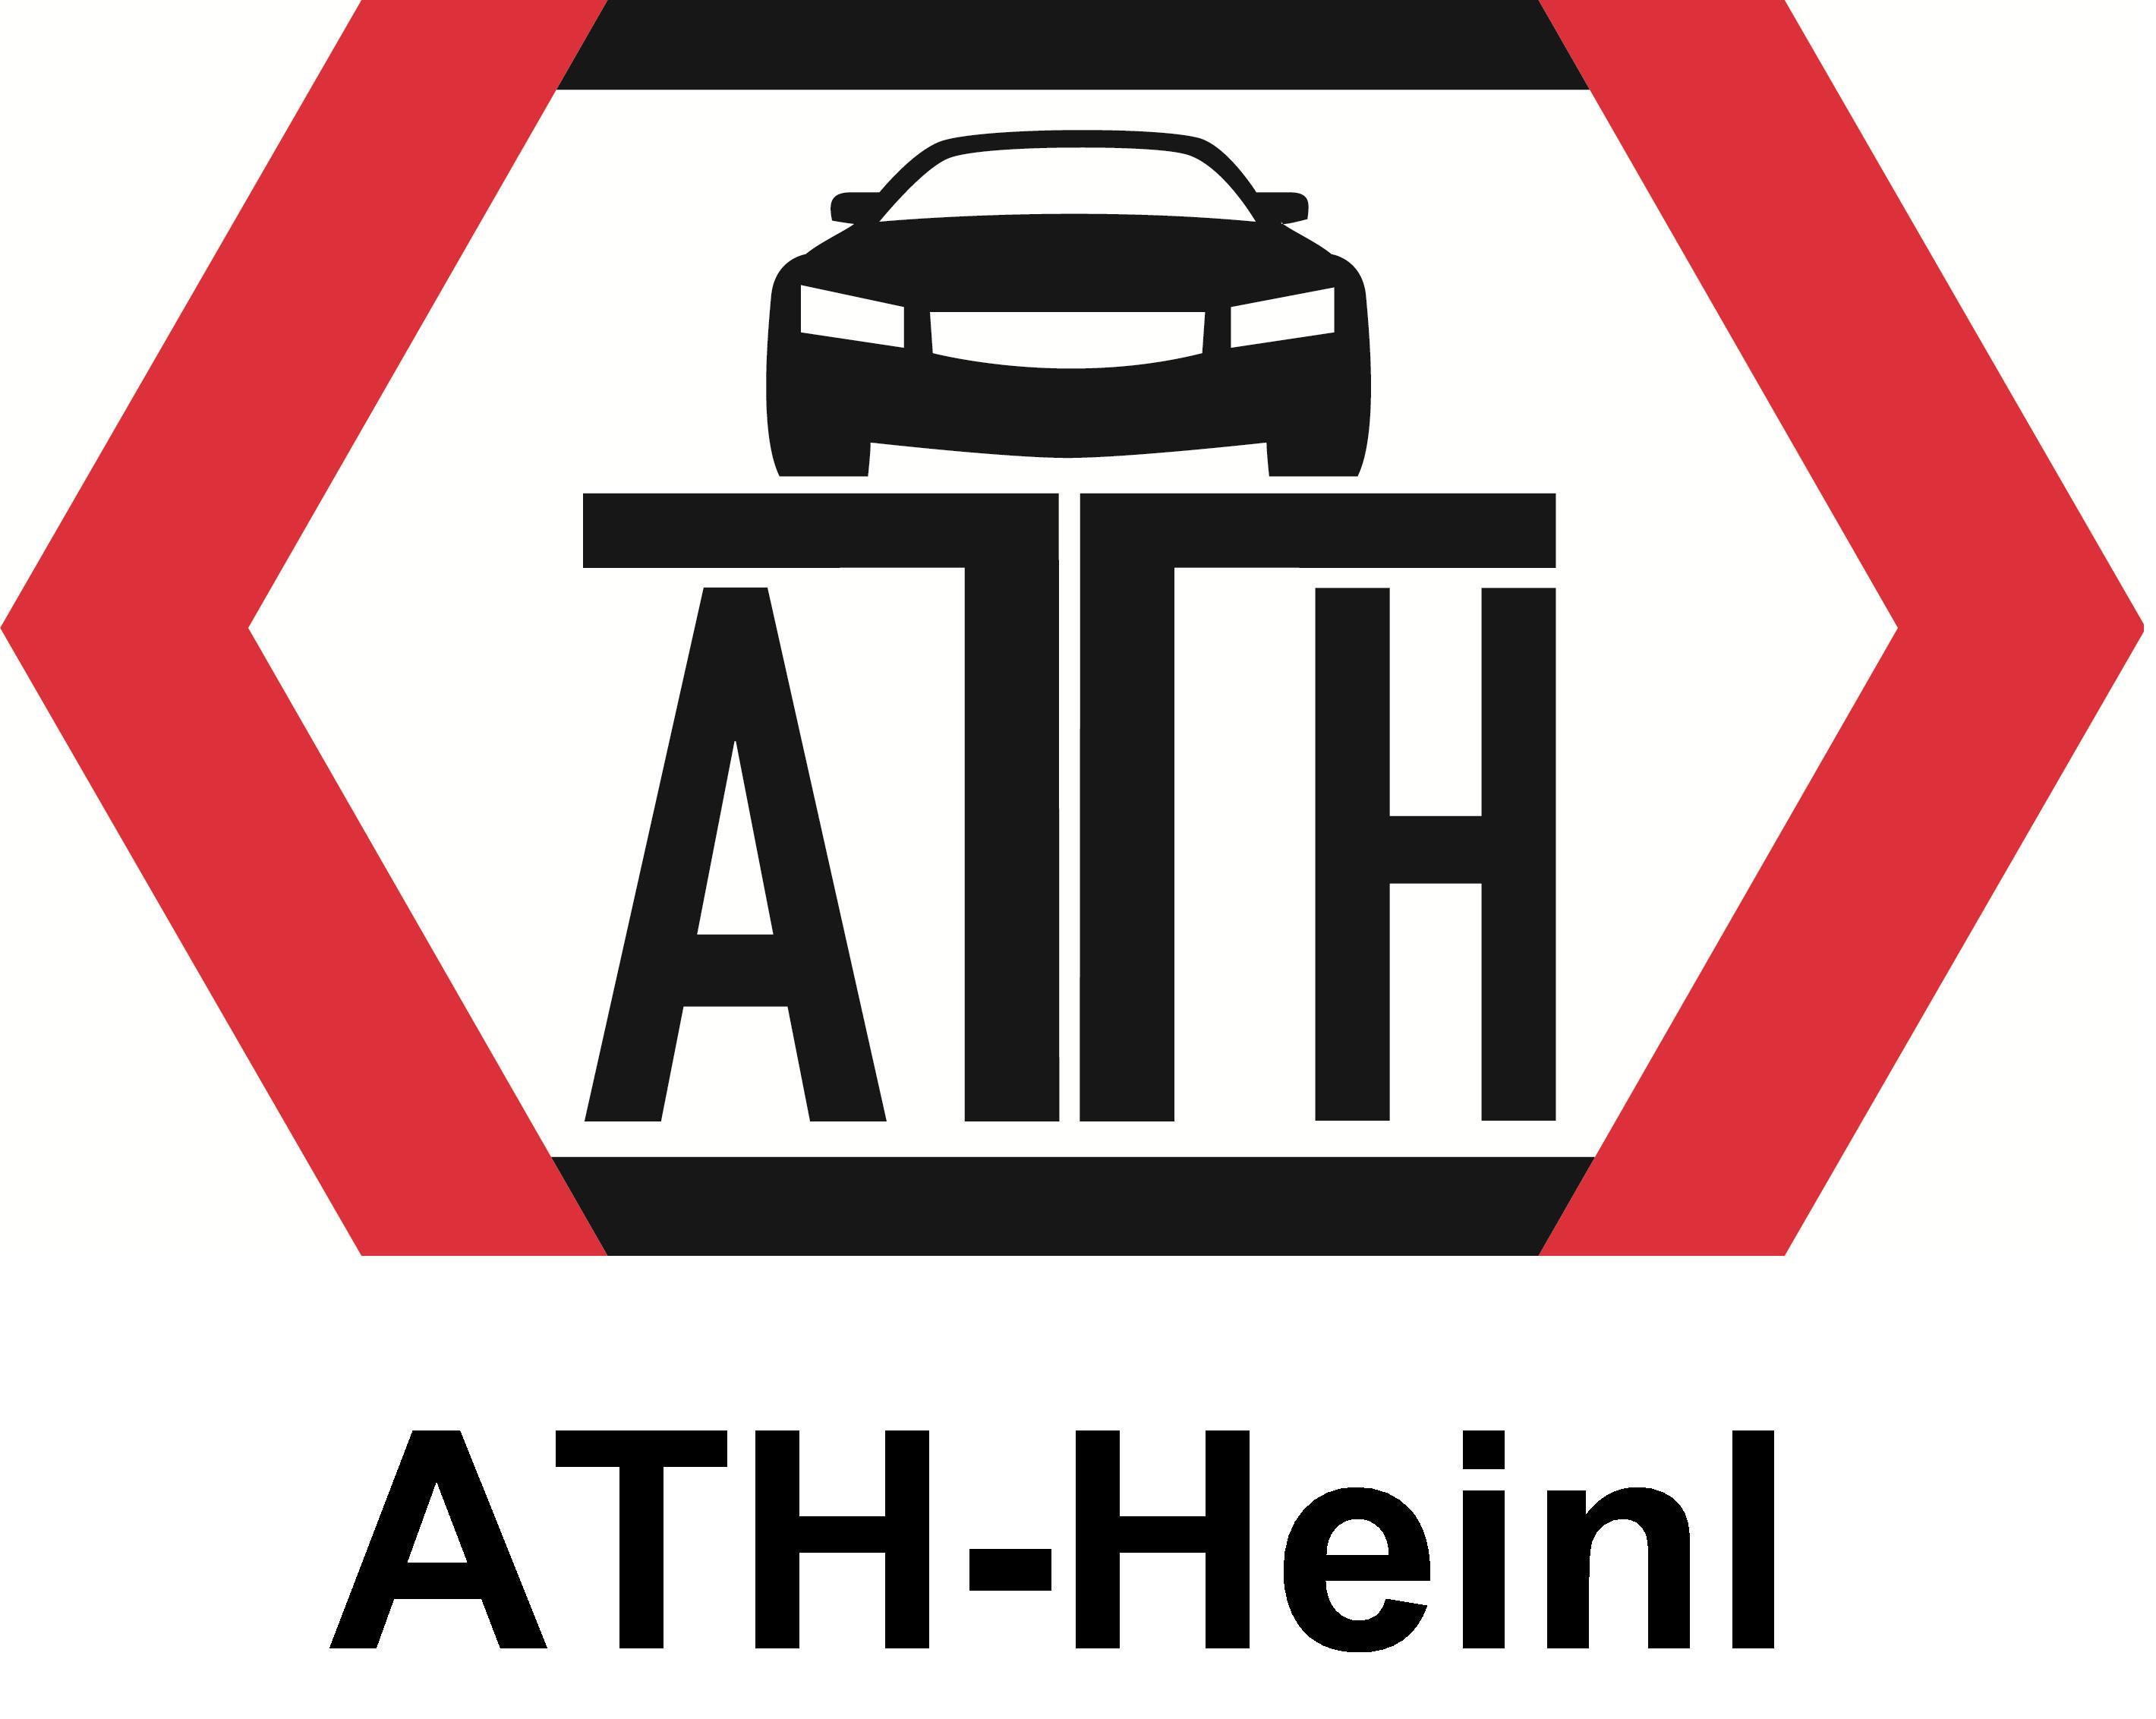 ATH-Frame Lift 35FZ